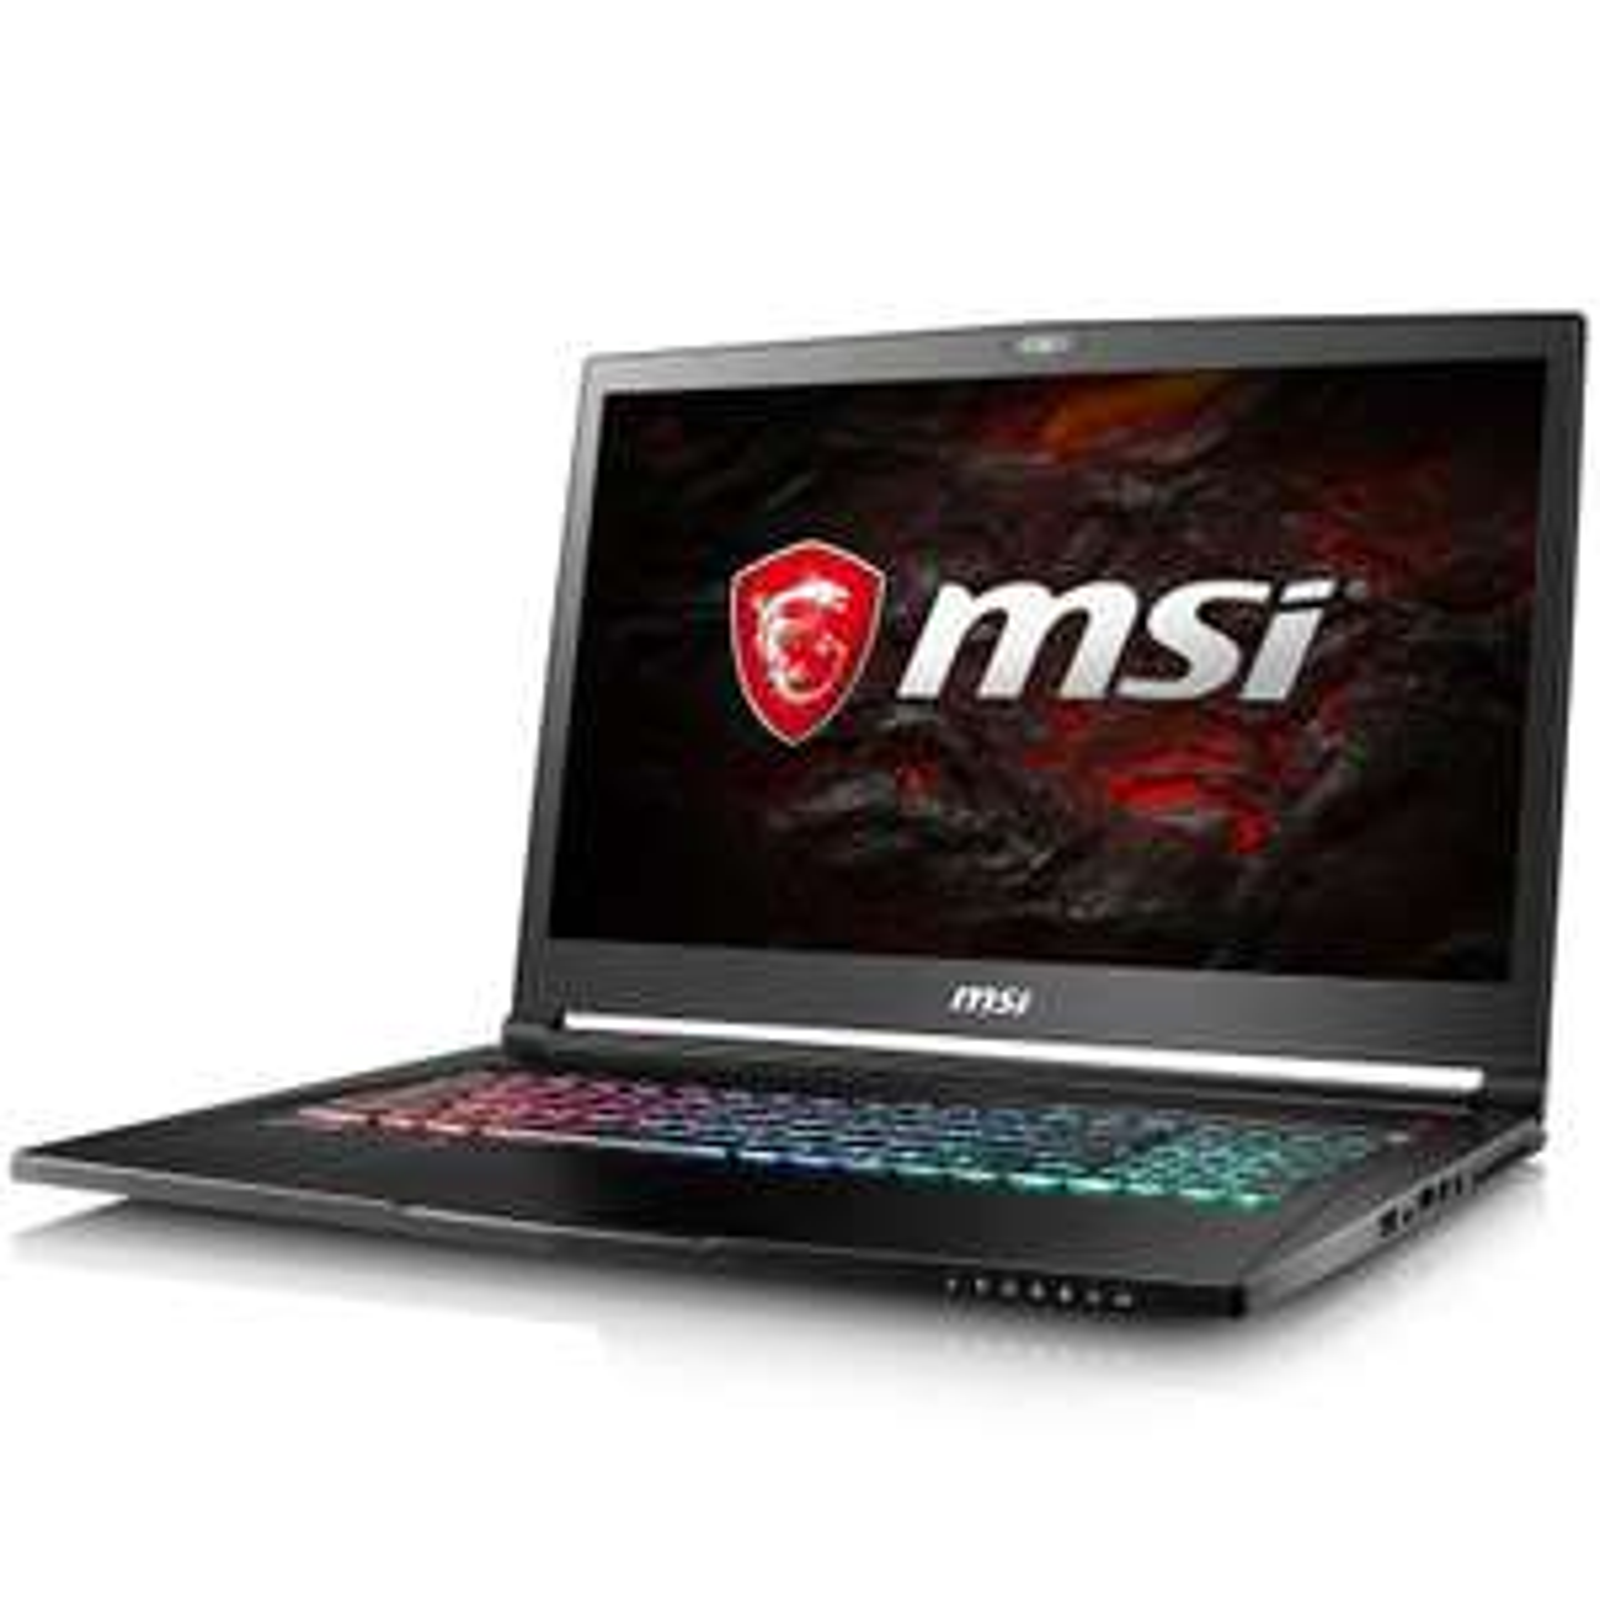 "PC Portable 17,3"" MSI GS73VR 7RG-013FR Stealth Pro - FullHD 120Hz, i7-7700HQ, 16Go de RAM, GTX 1070 8Go, 256Go de SSD + 2To de HDD"